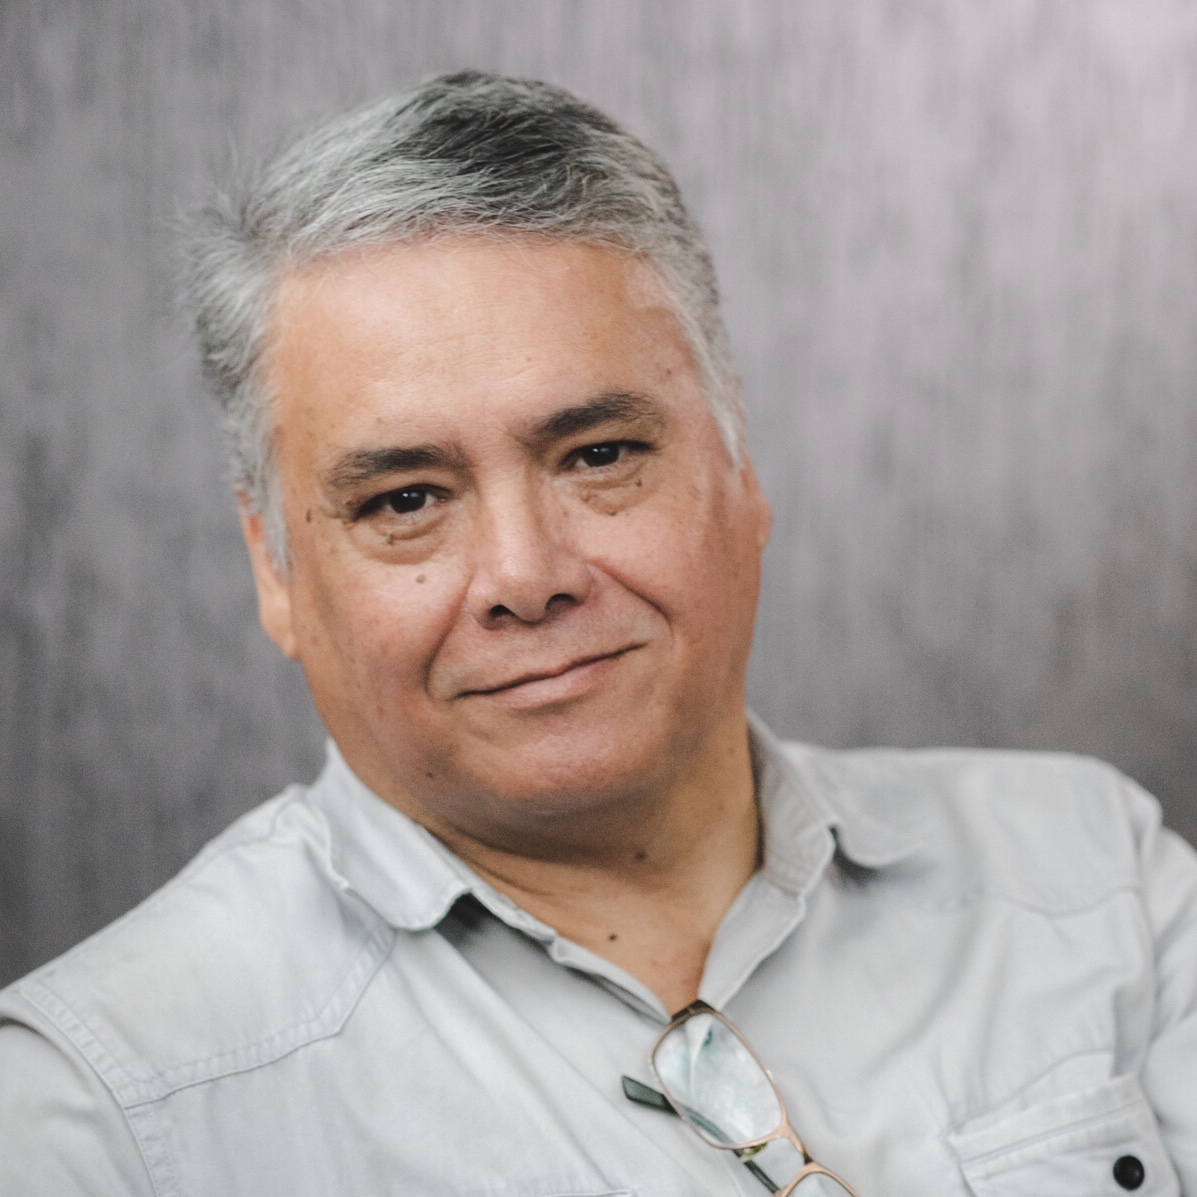 Luiz Carlos Sourient Junior